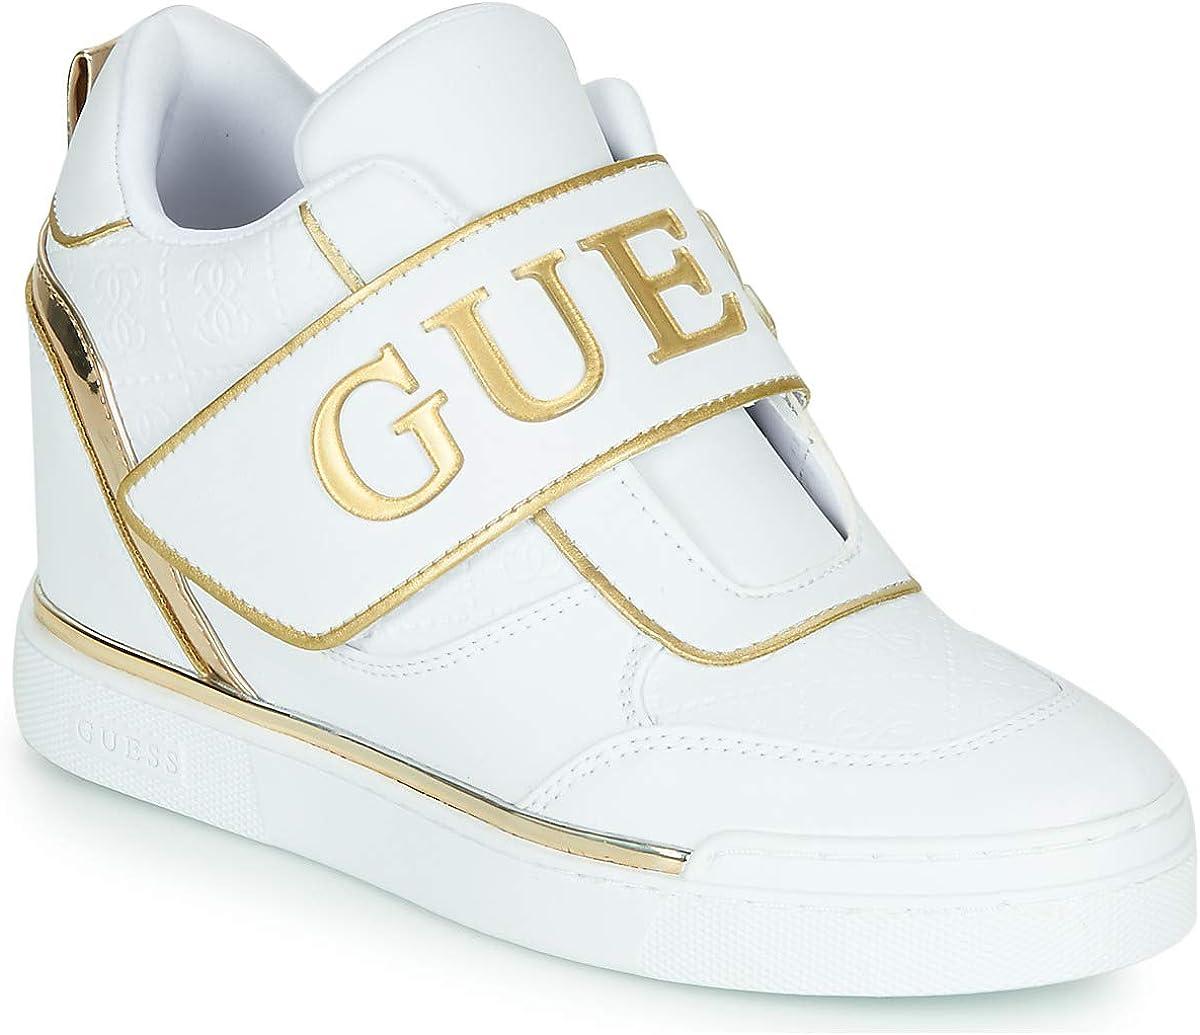 GUESS FOLLIE White FL5FOL ELE12, Zapatillas con cuña para Mujer